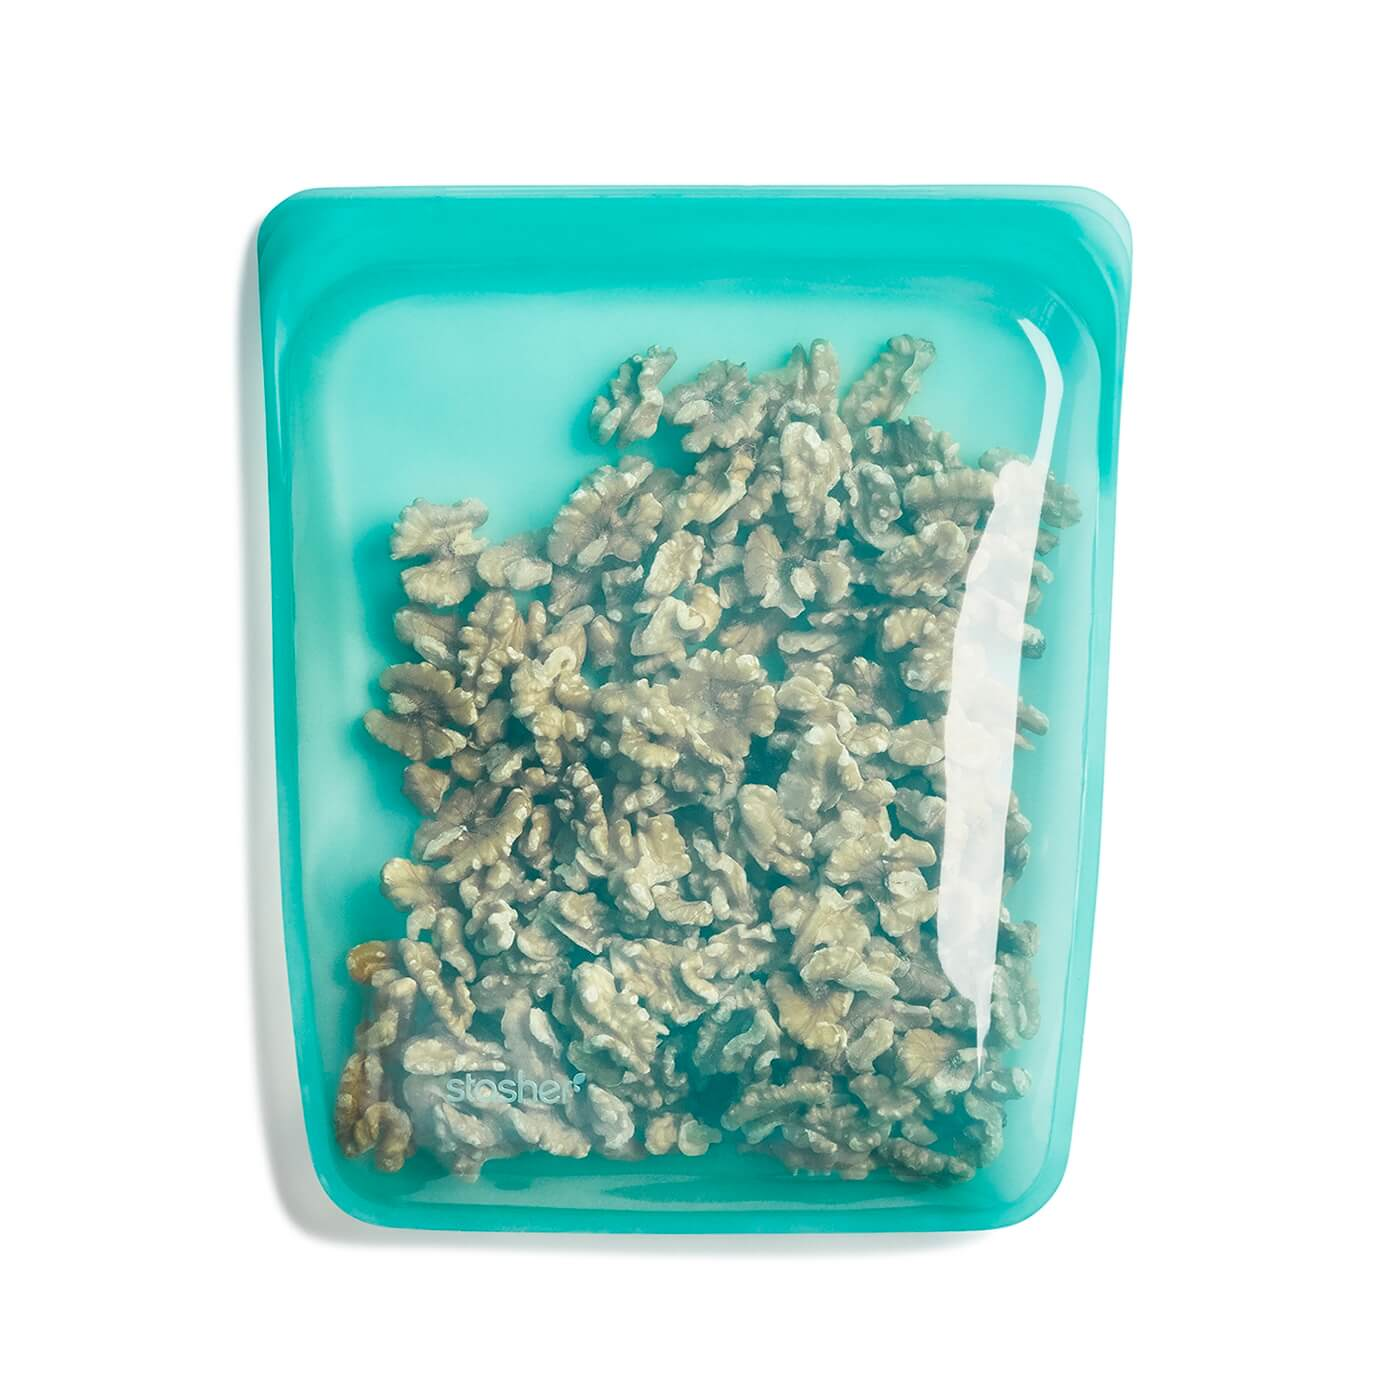 Stasher Bag Groot Aqua